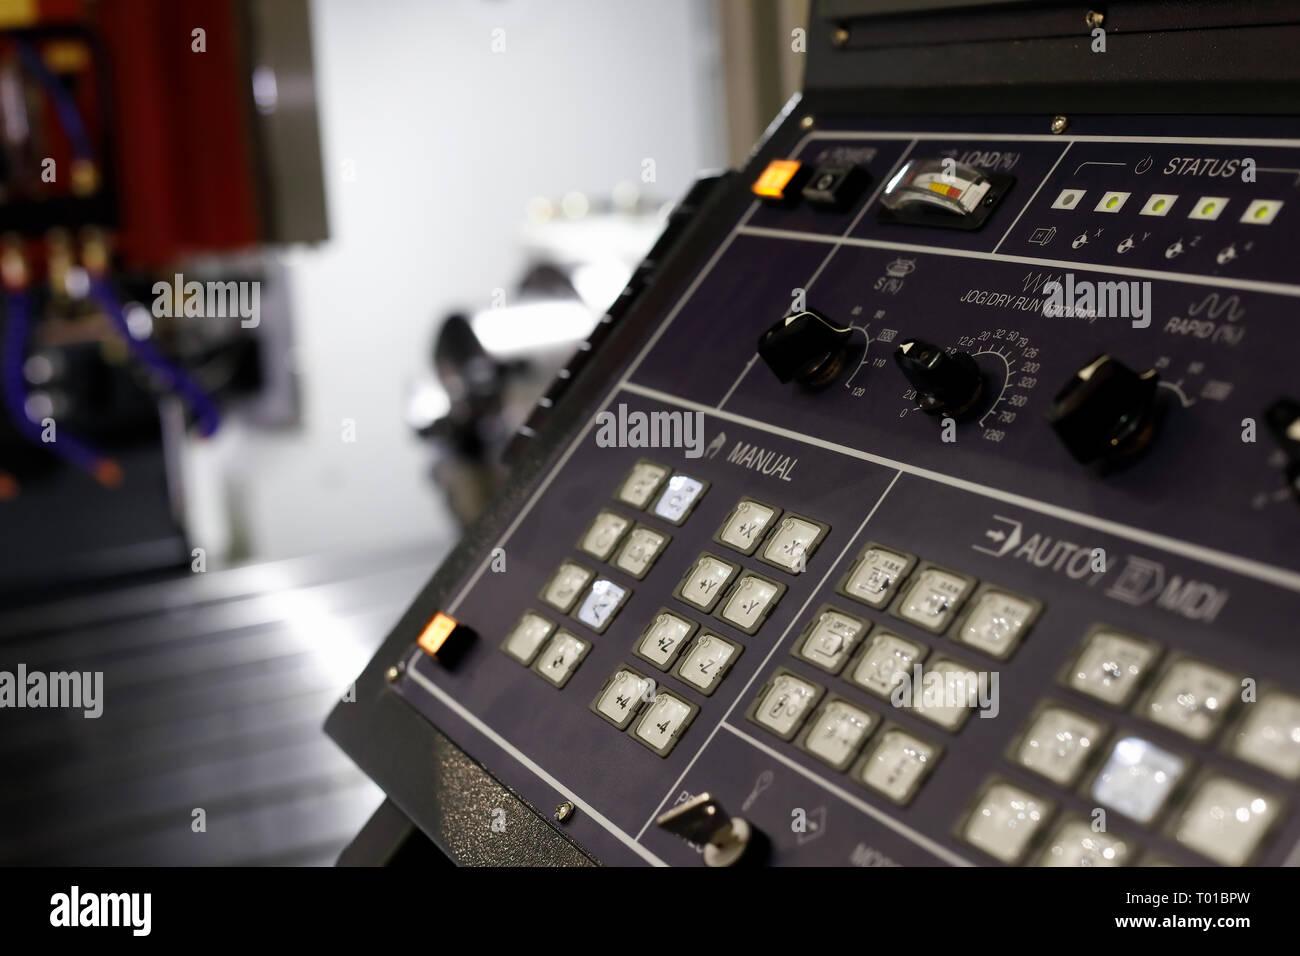 CNC control panel of lathe machining center. Selective focus. - Stock Image